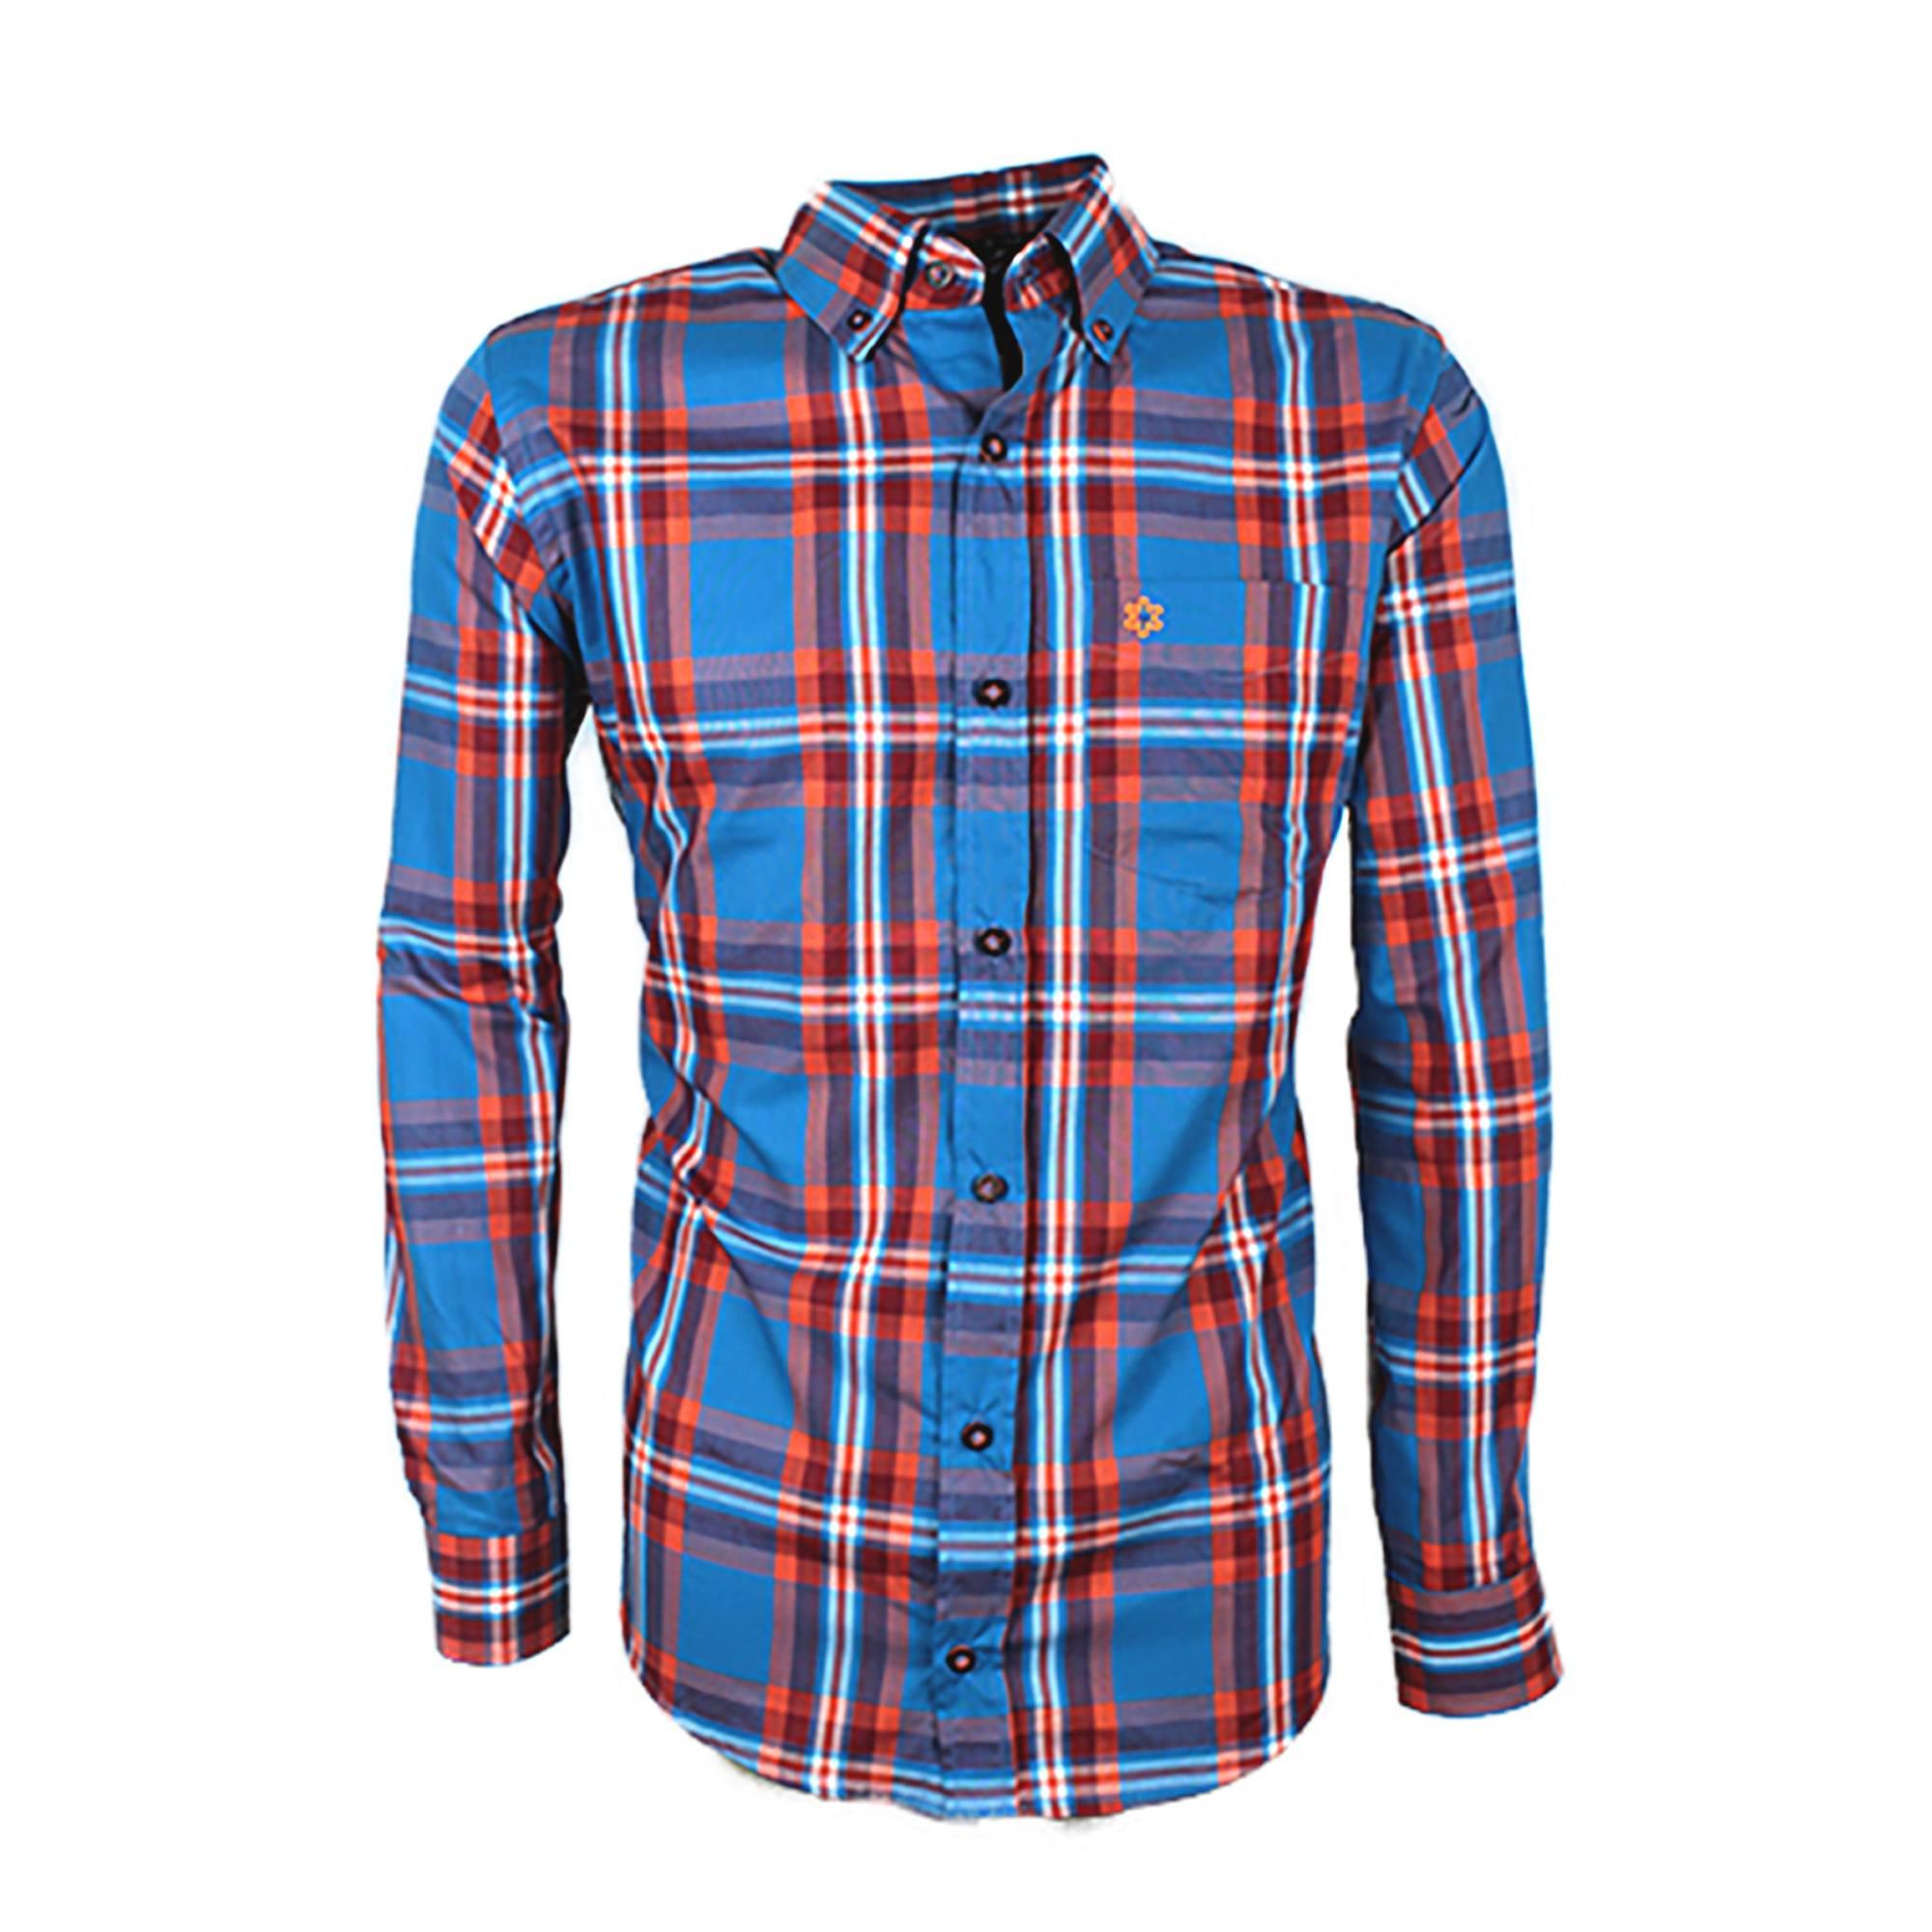 Camisa Masculina Manga Longa Xadrez Azul e Laranja Bordado laranja Neon